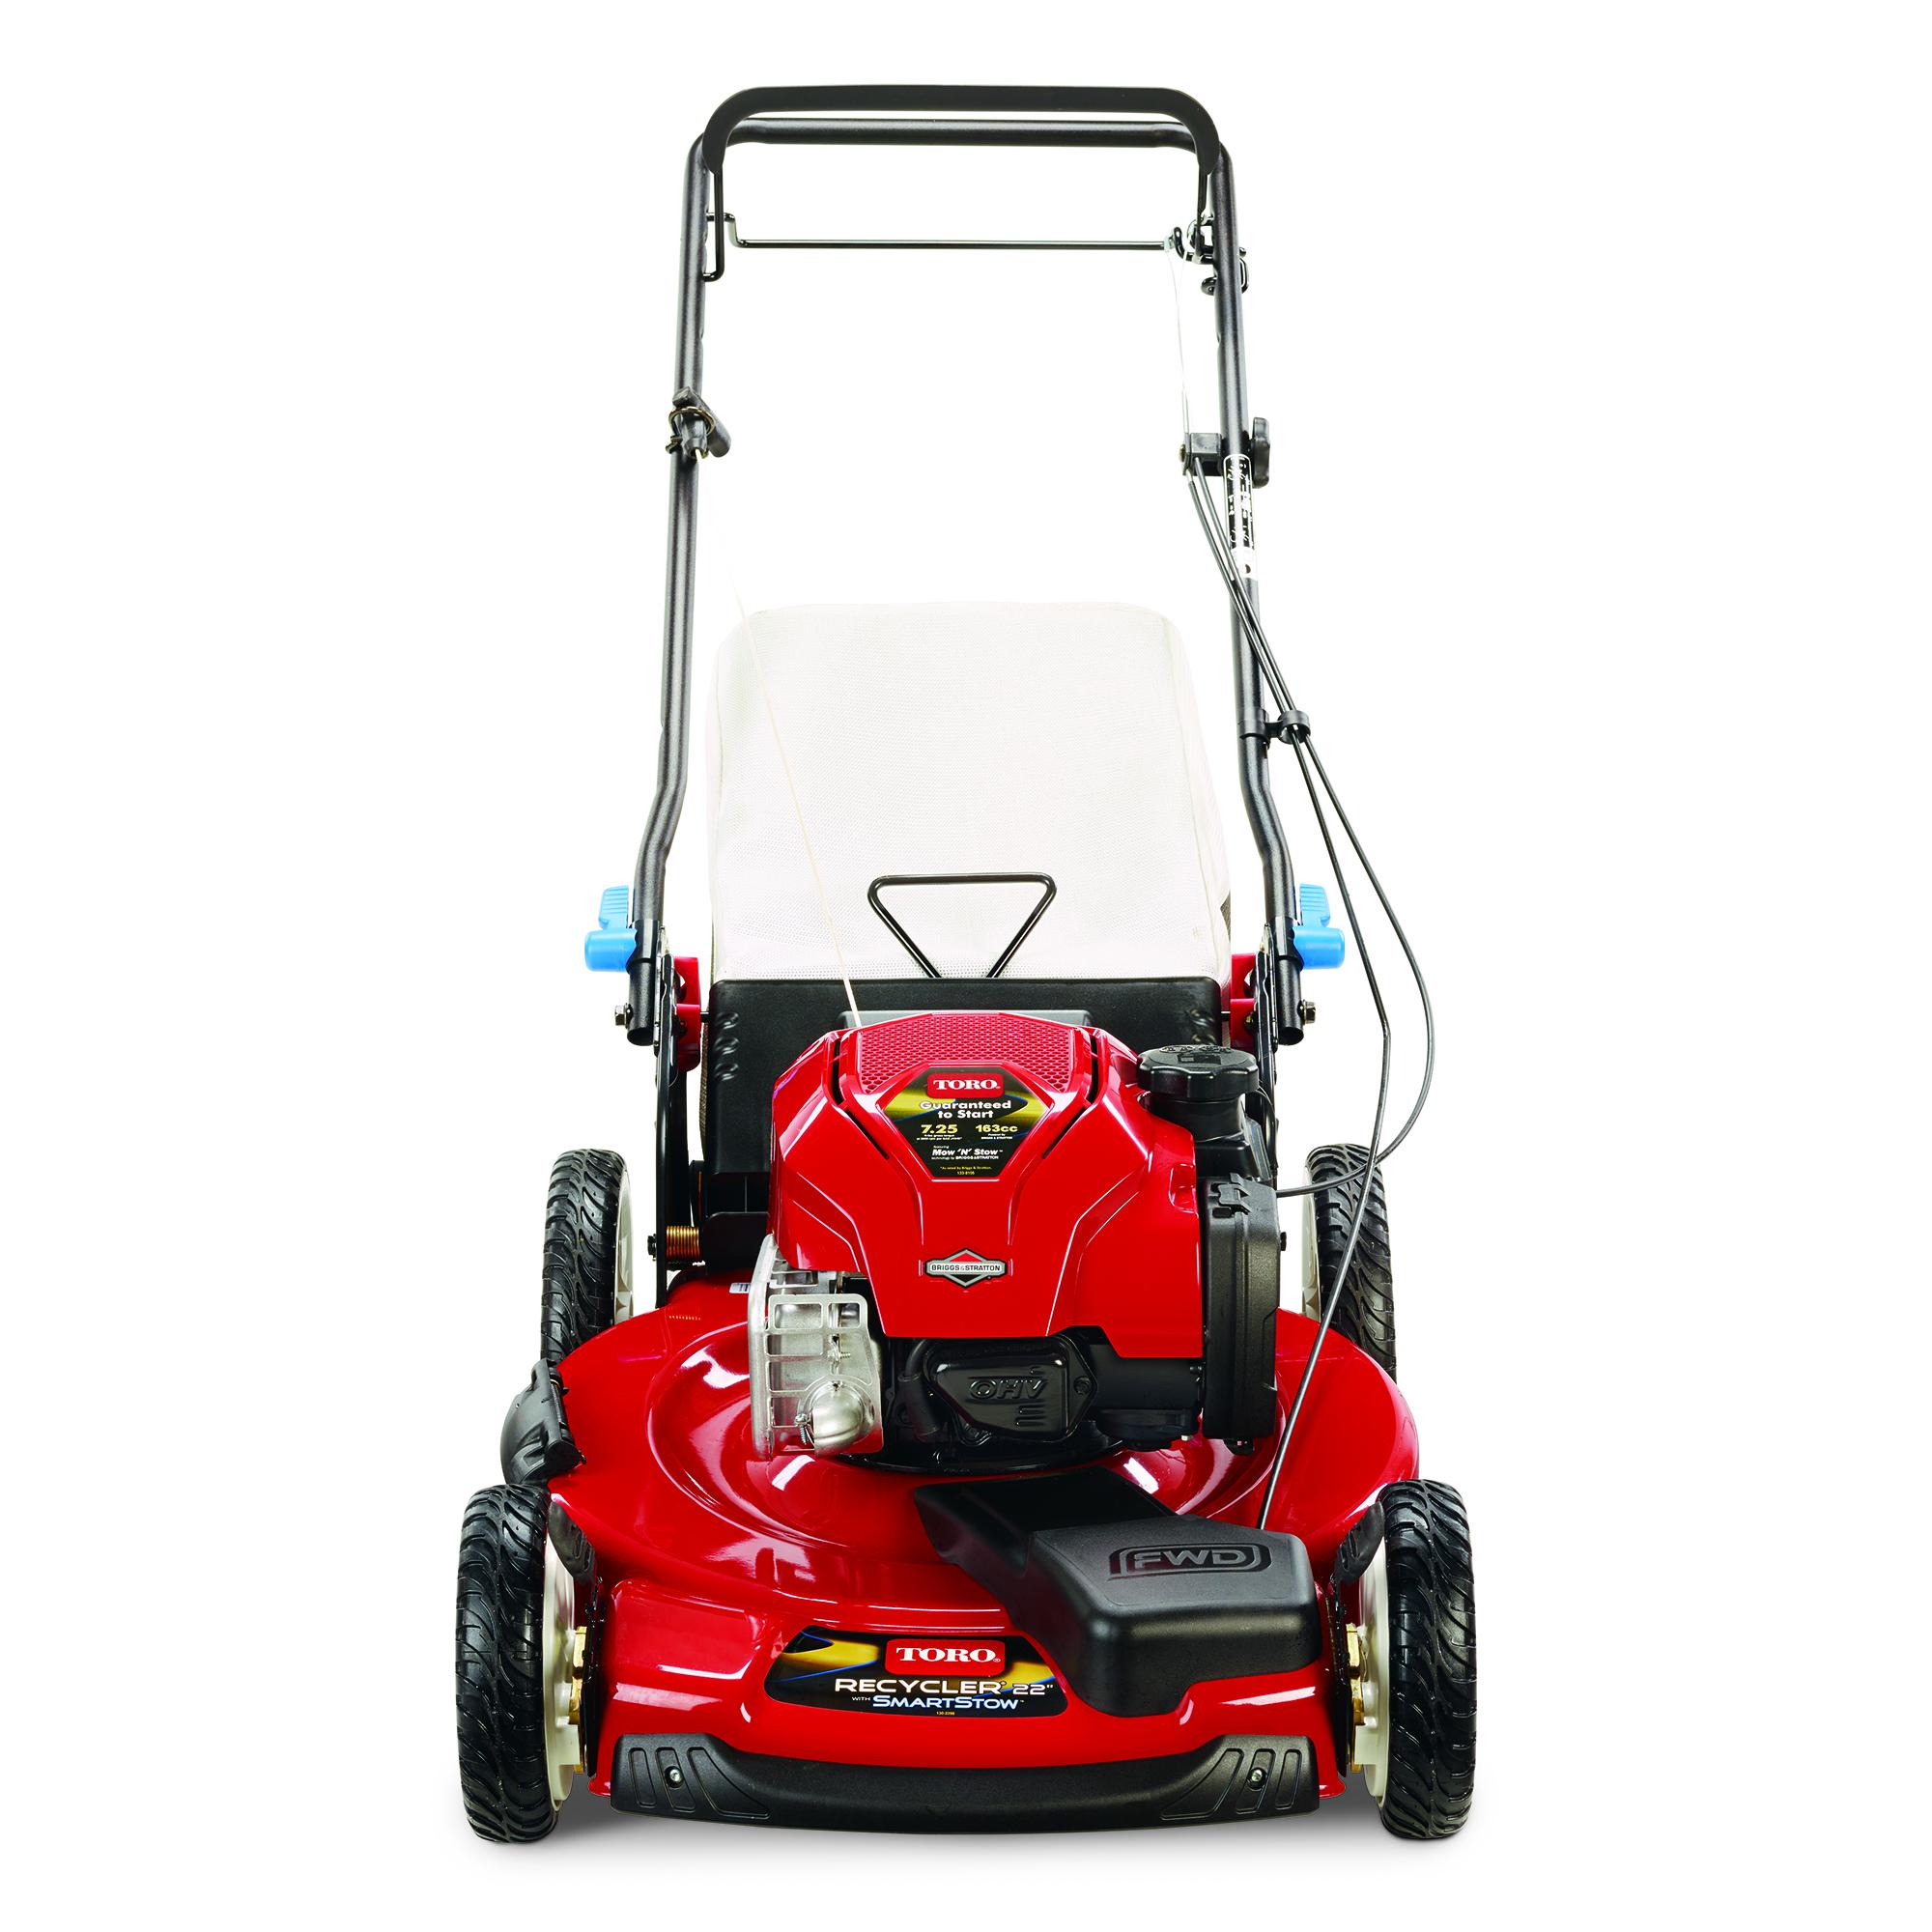 Parts For Lawn Mower Toro: Toro Lawn Mower: Model 20339 Parts & Repair Help